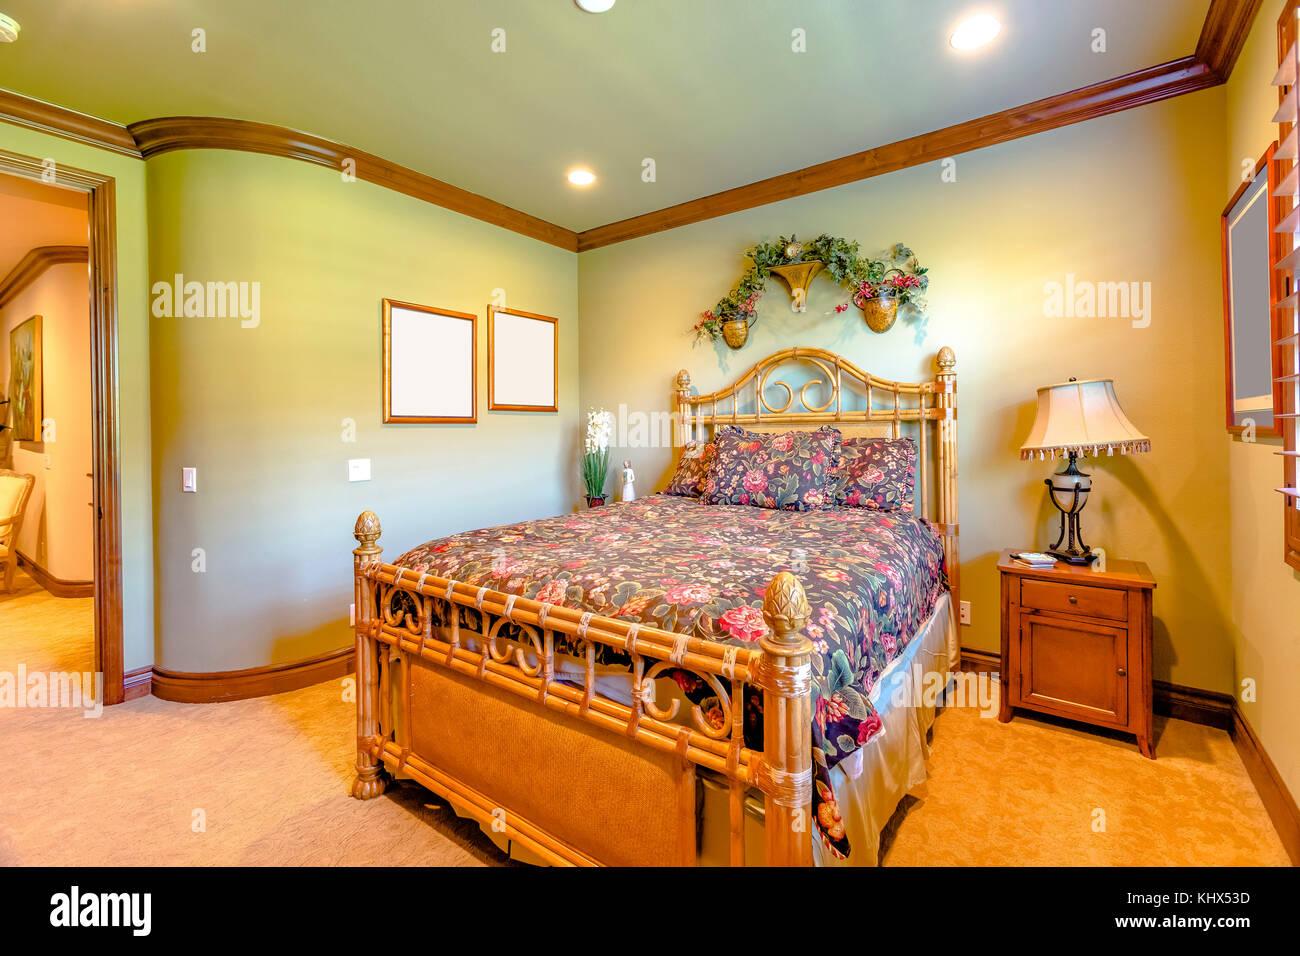 Luxury Bedroom In California With Orange Warm Lighting And Carpet